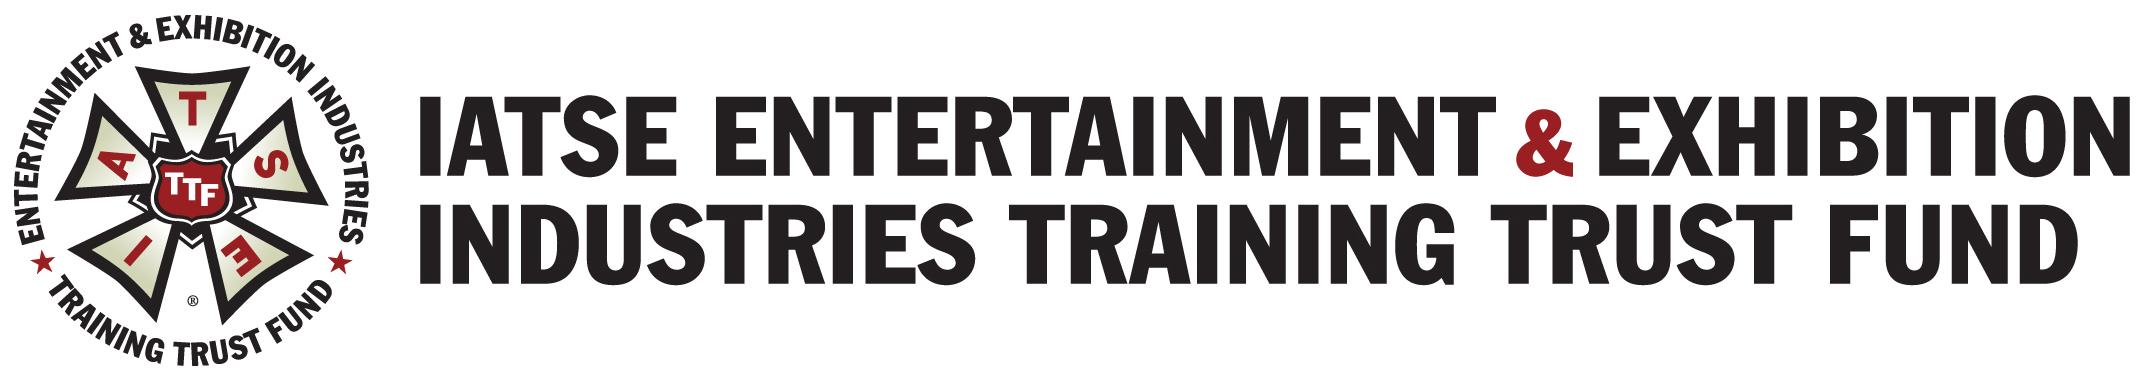 IATSE Entertainment and Exhibition Industries Training Trust Fund